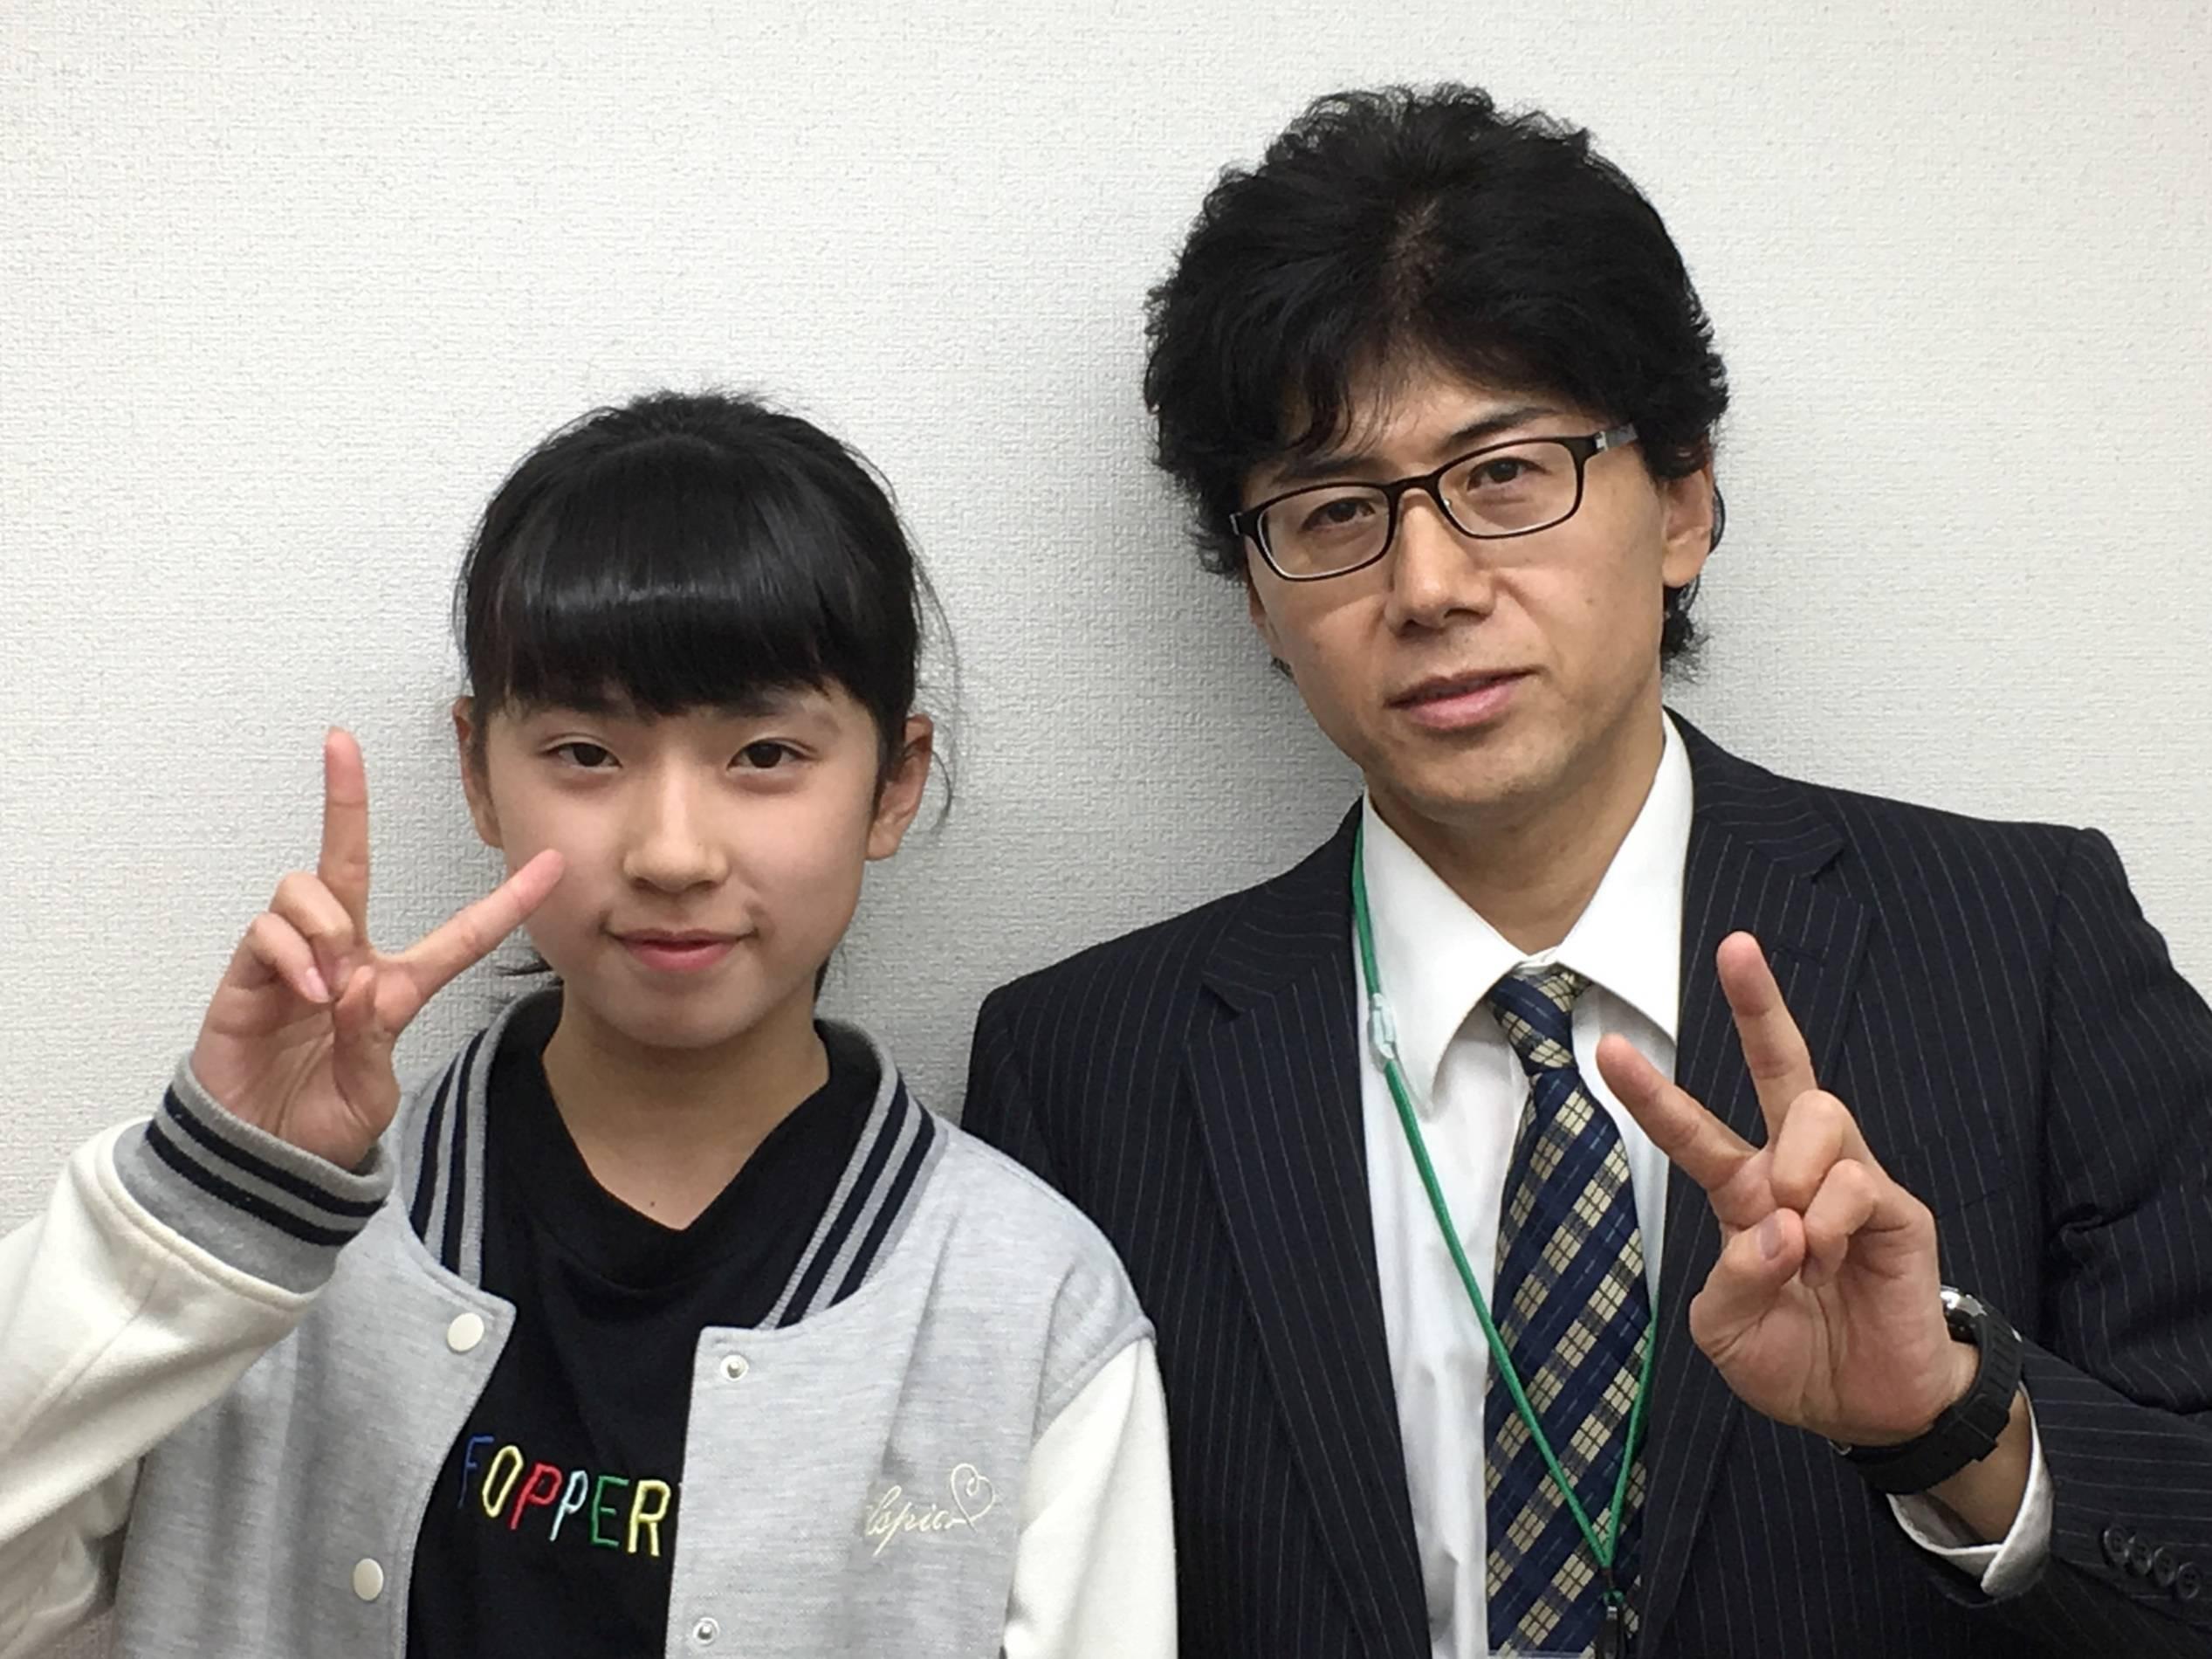 H29夏 中学2年 森屋恋さん 吉村先生